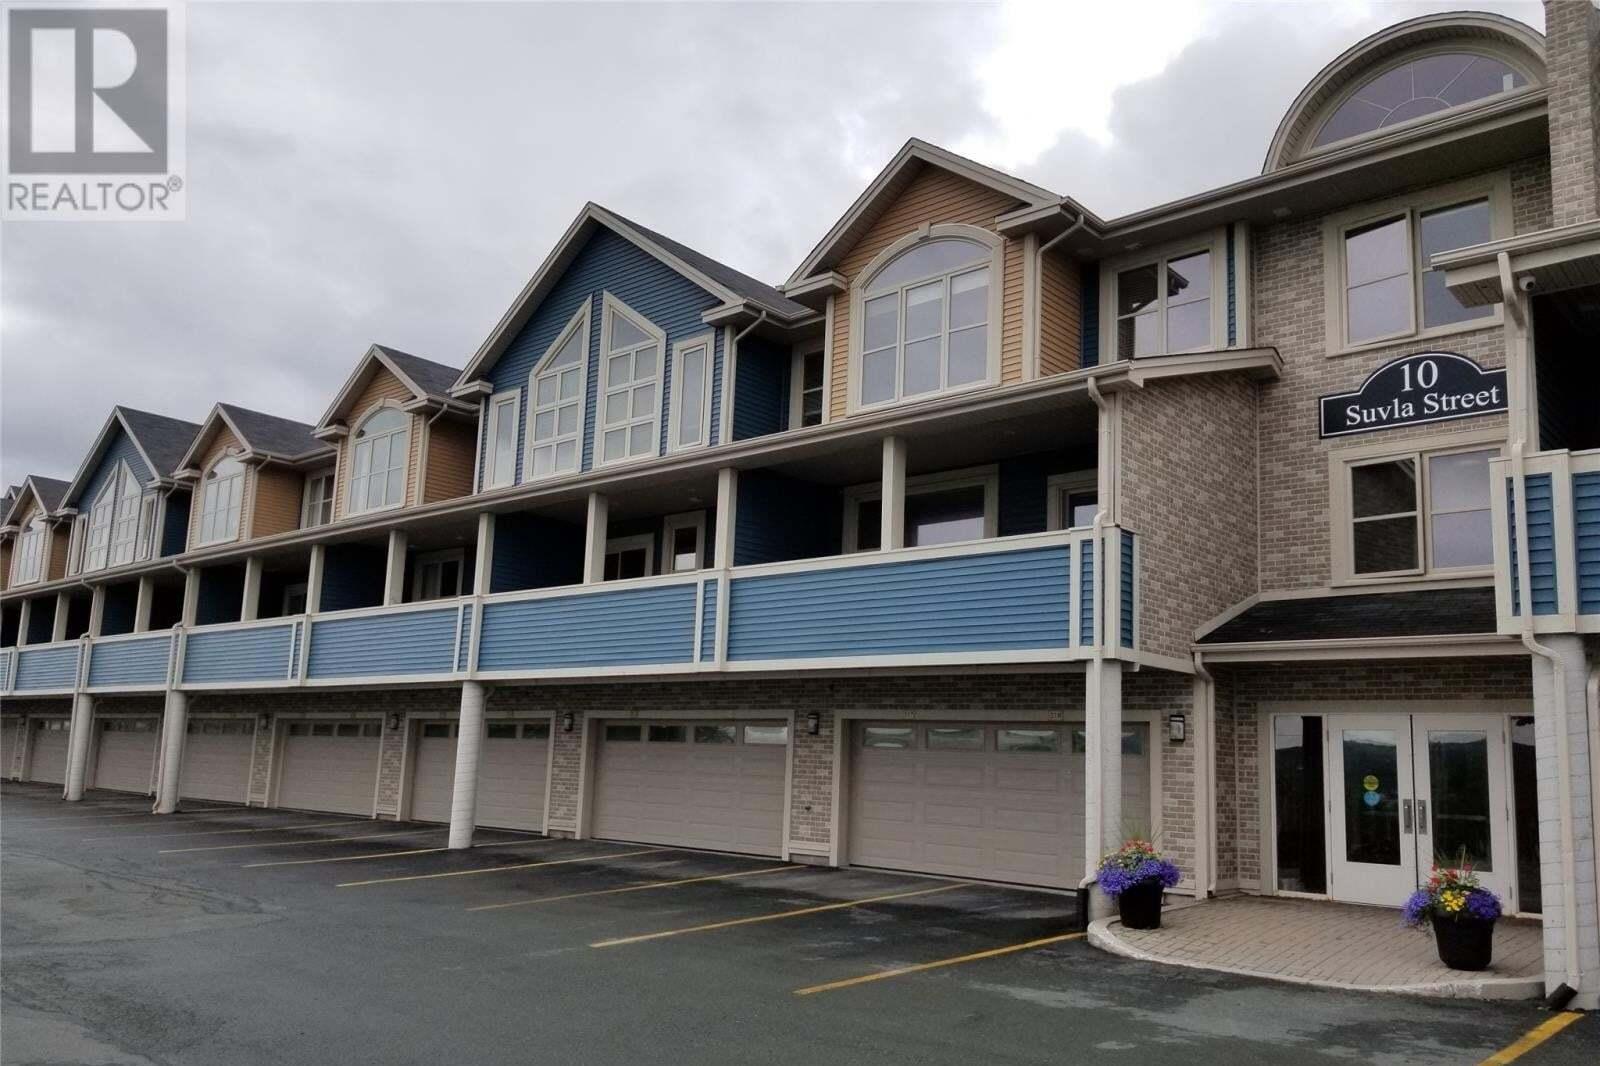 House for sale at 10 Suvla St St. John's Newfoundland - MLS: 1221314